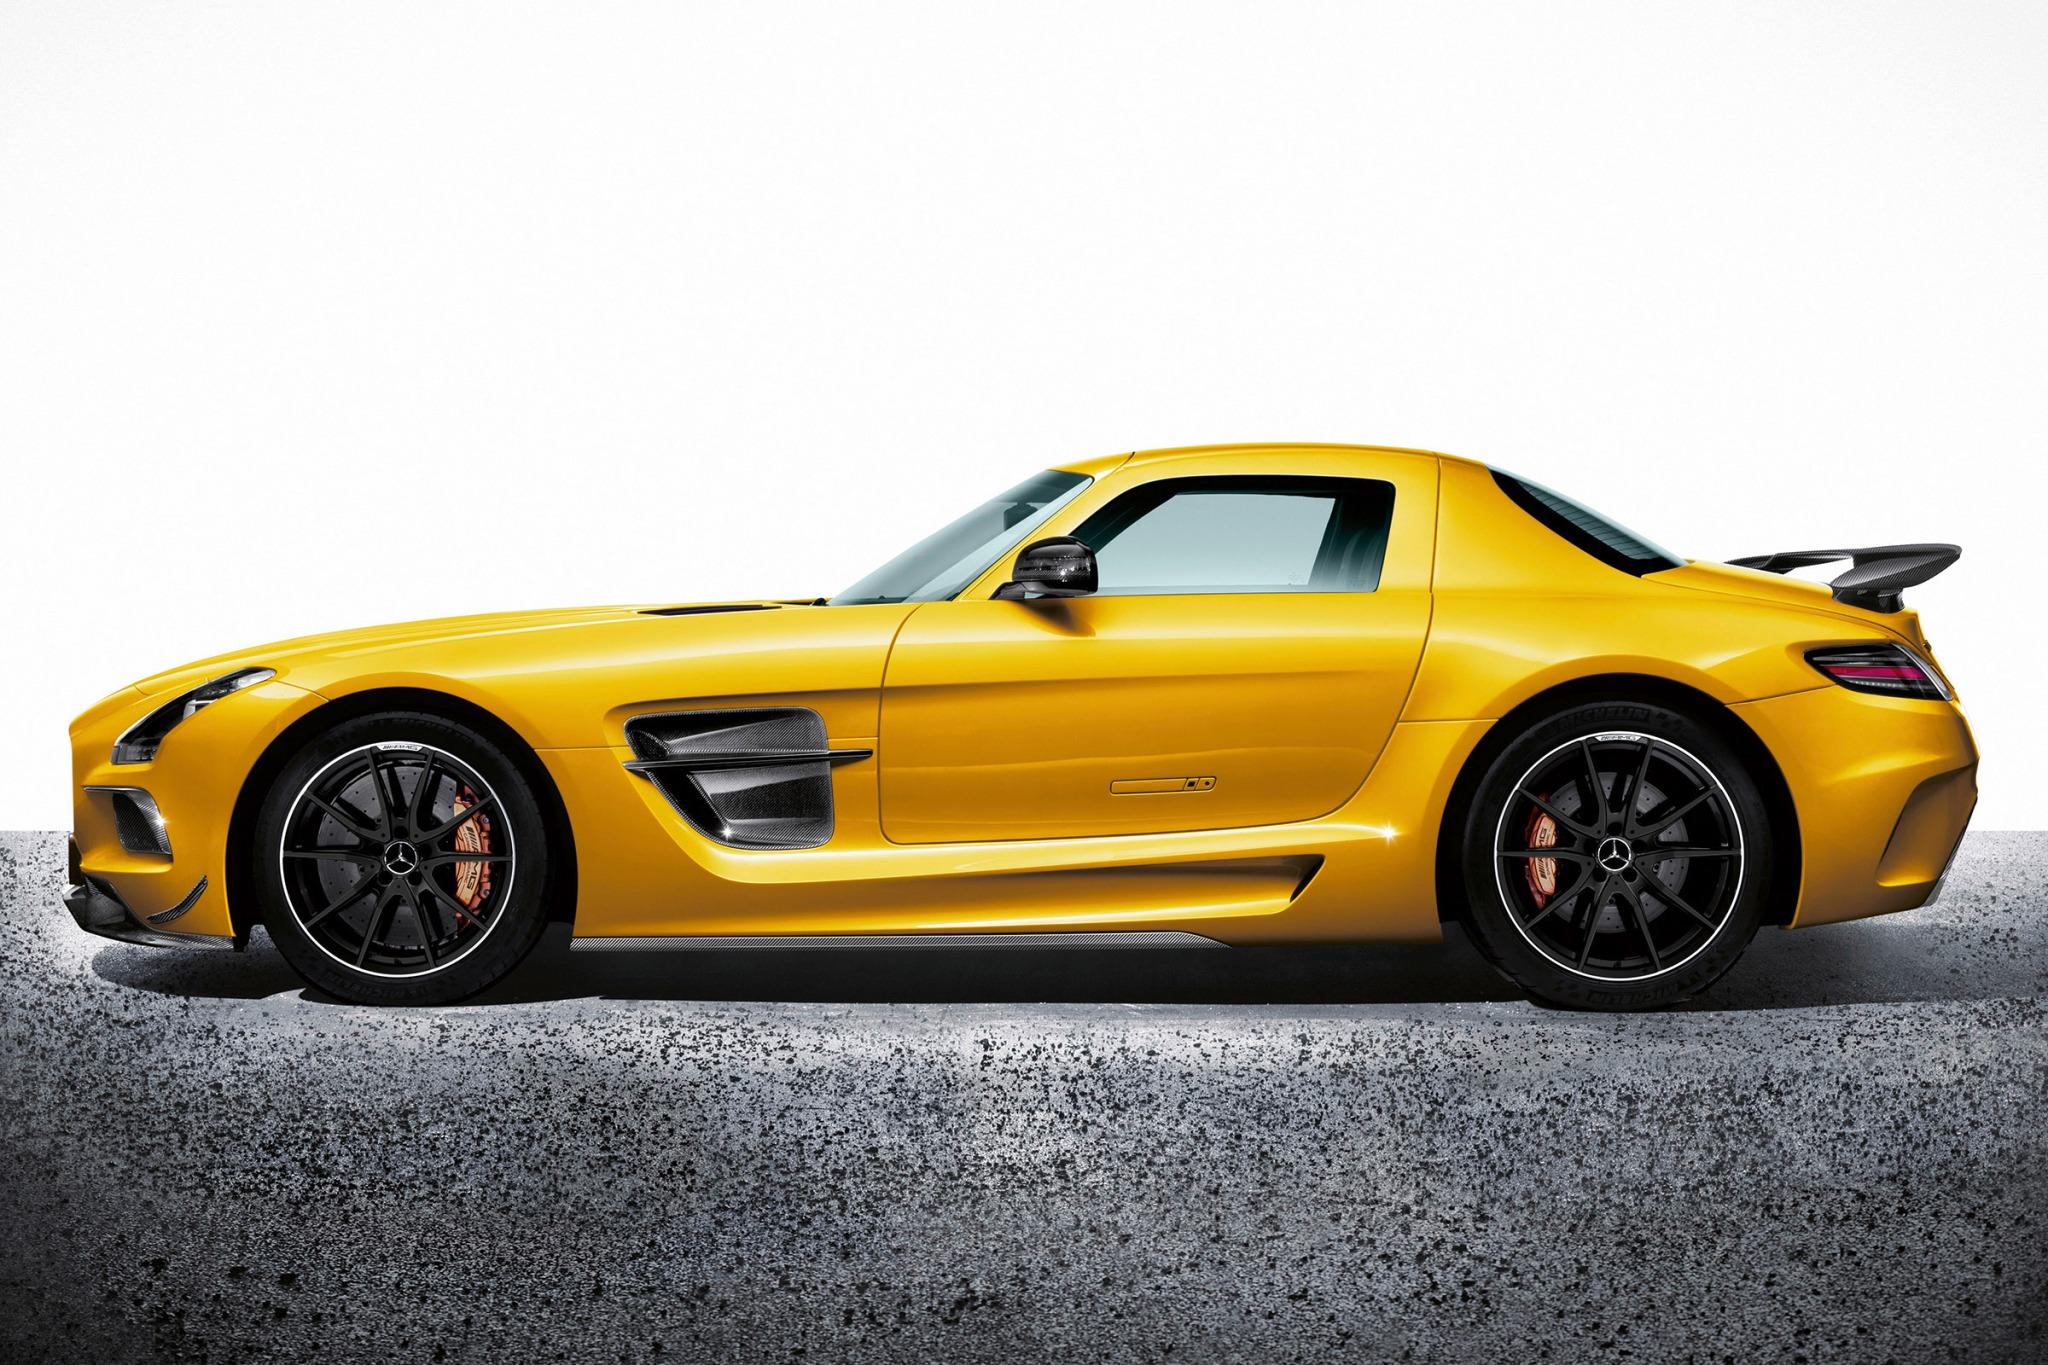 2014 mercedes benz sls amg gt image 2 - Mercedes sls amg gt coupe ...